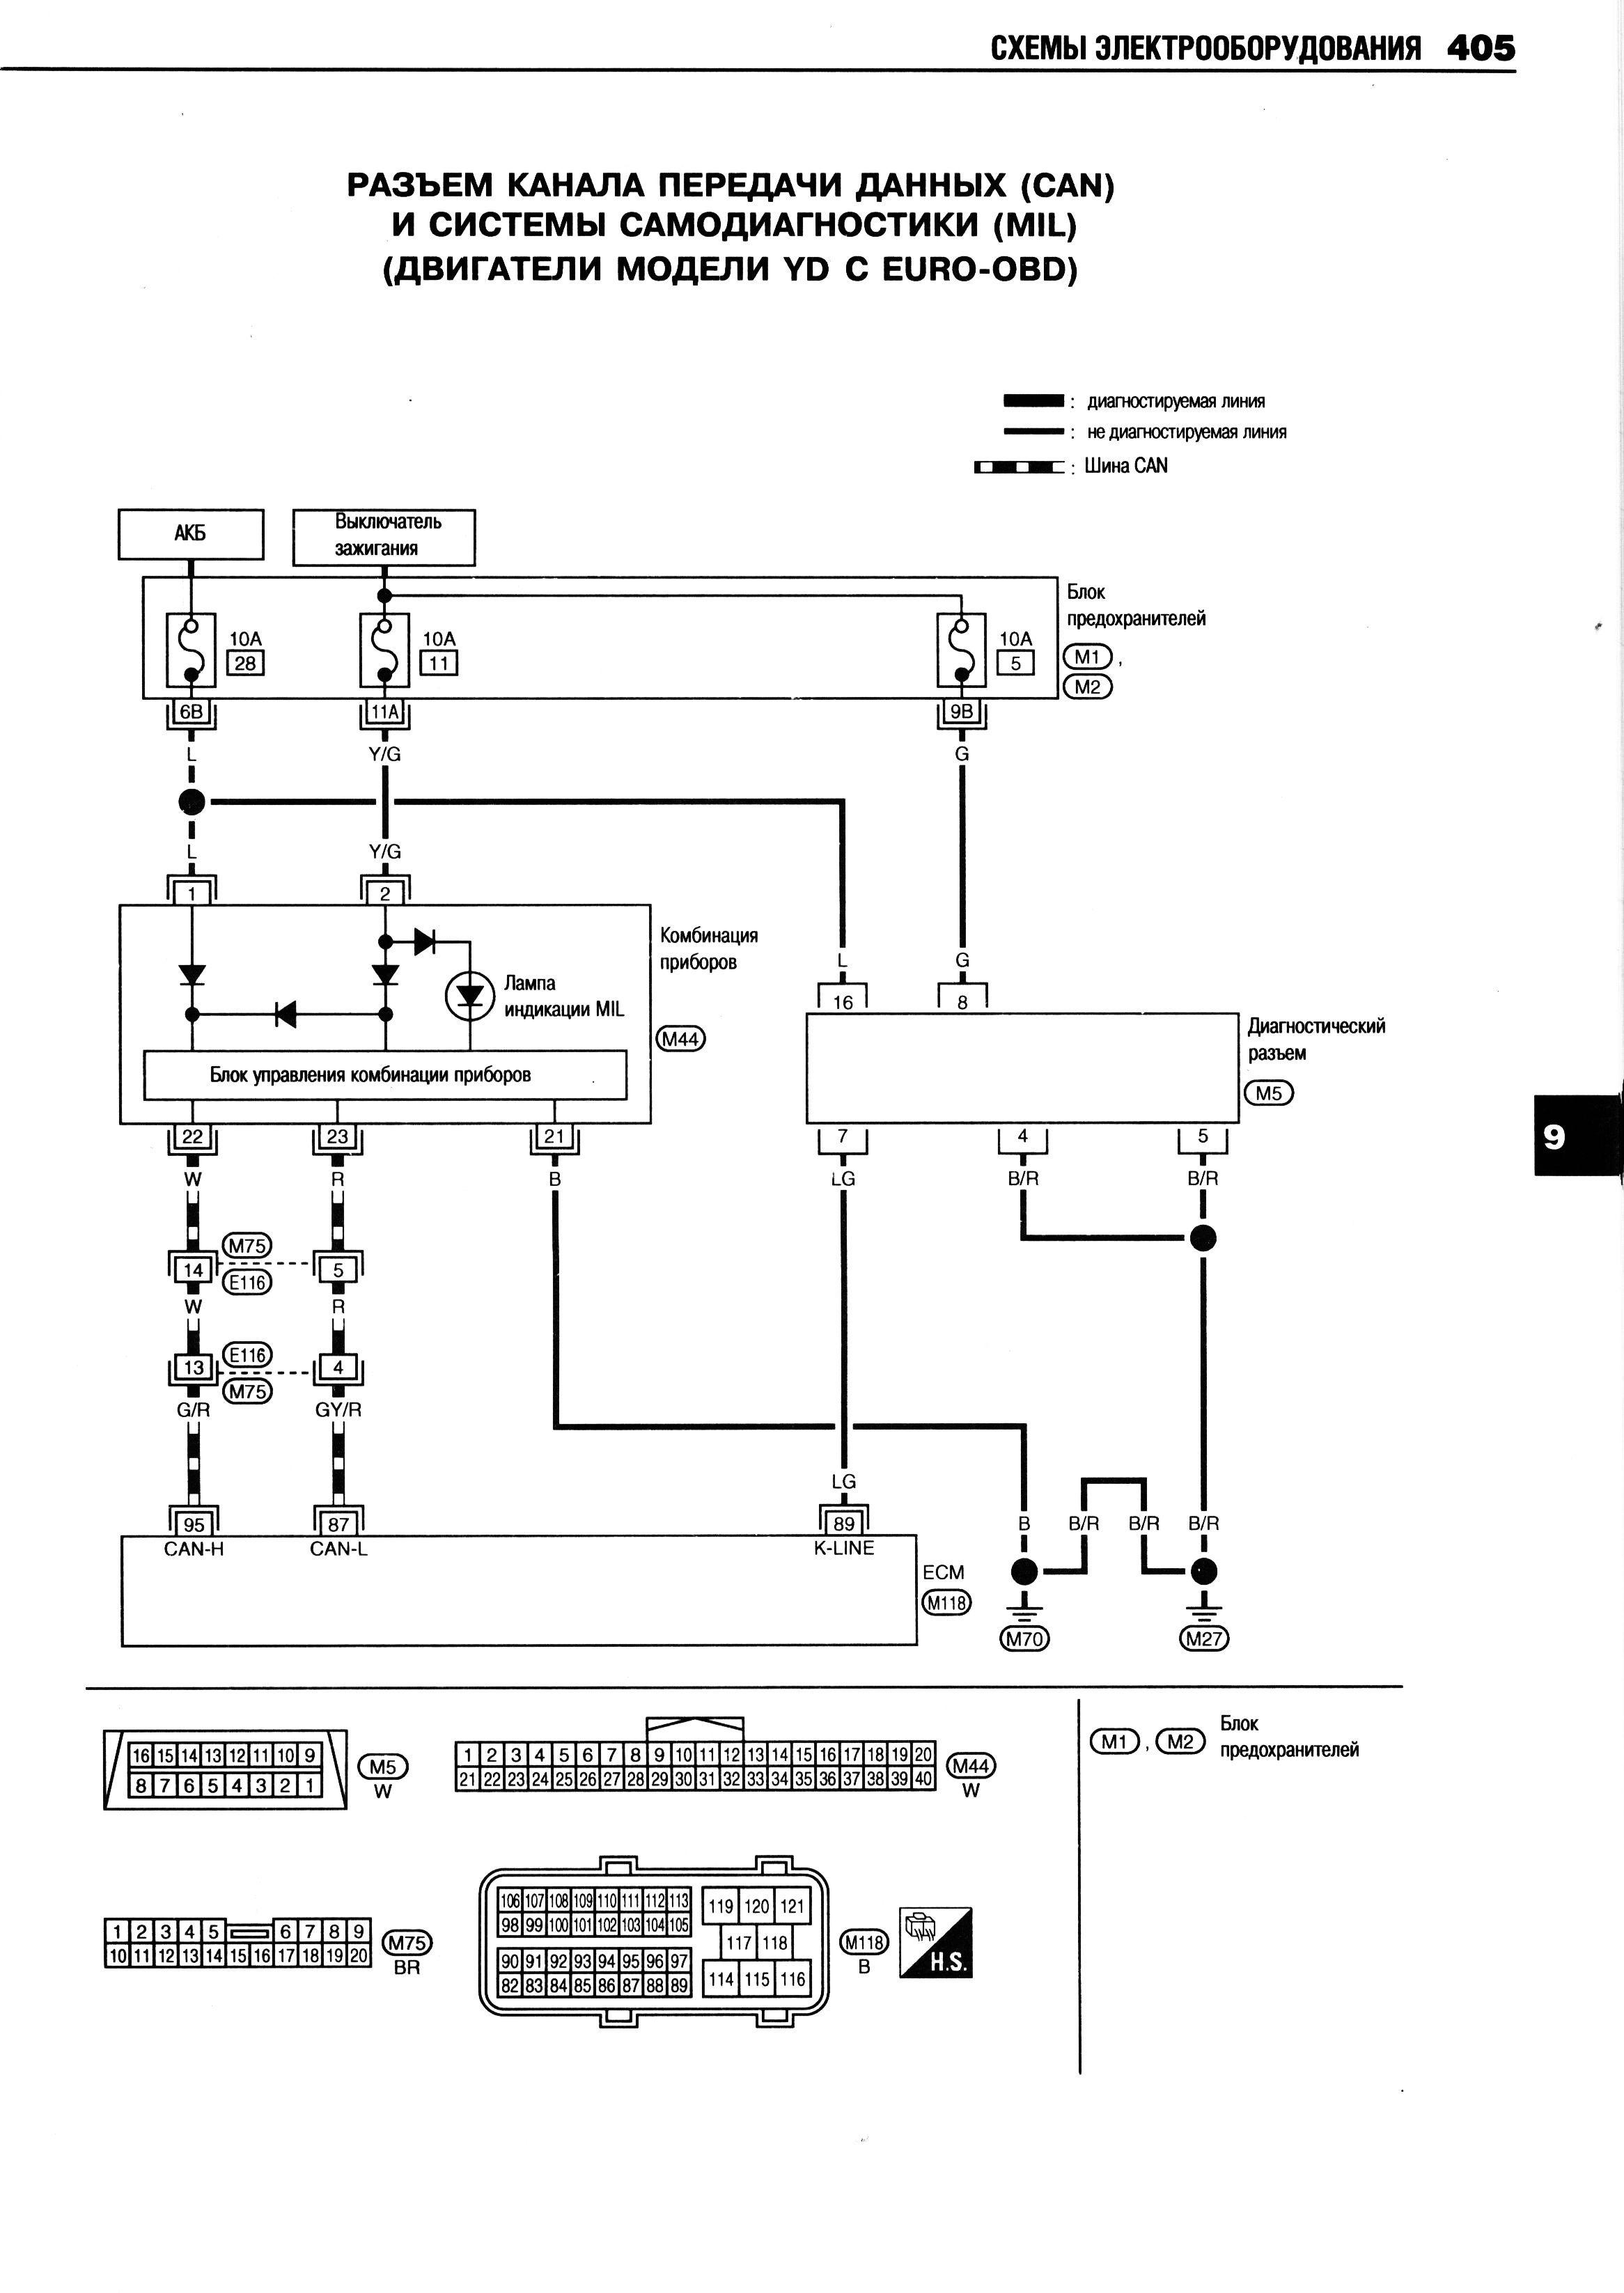 Руководство по ремонту ниссан х-трейл т31 скачать